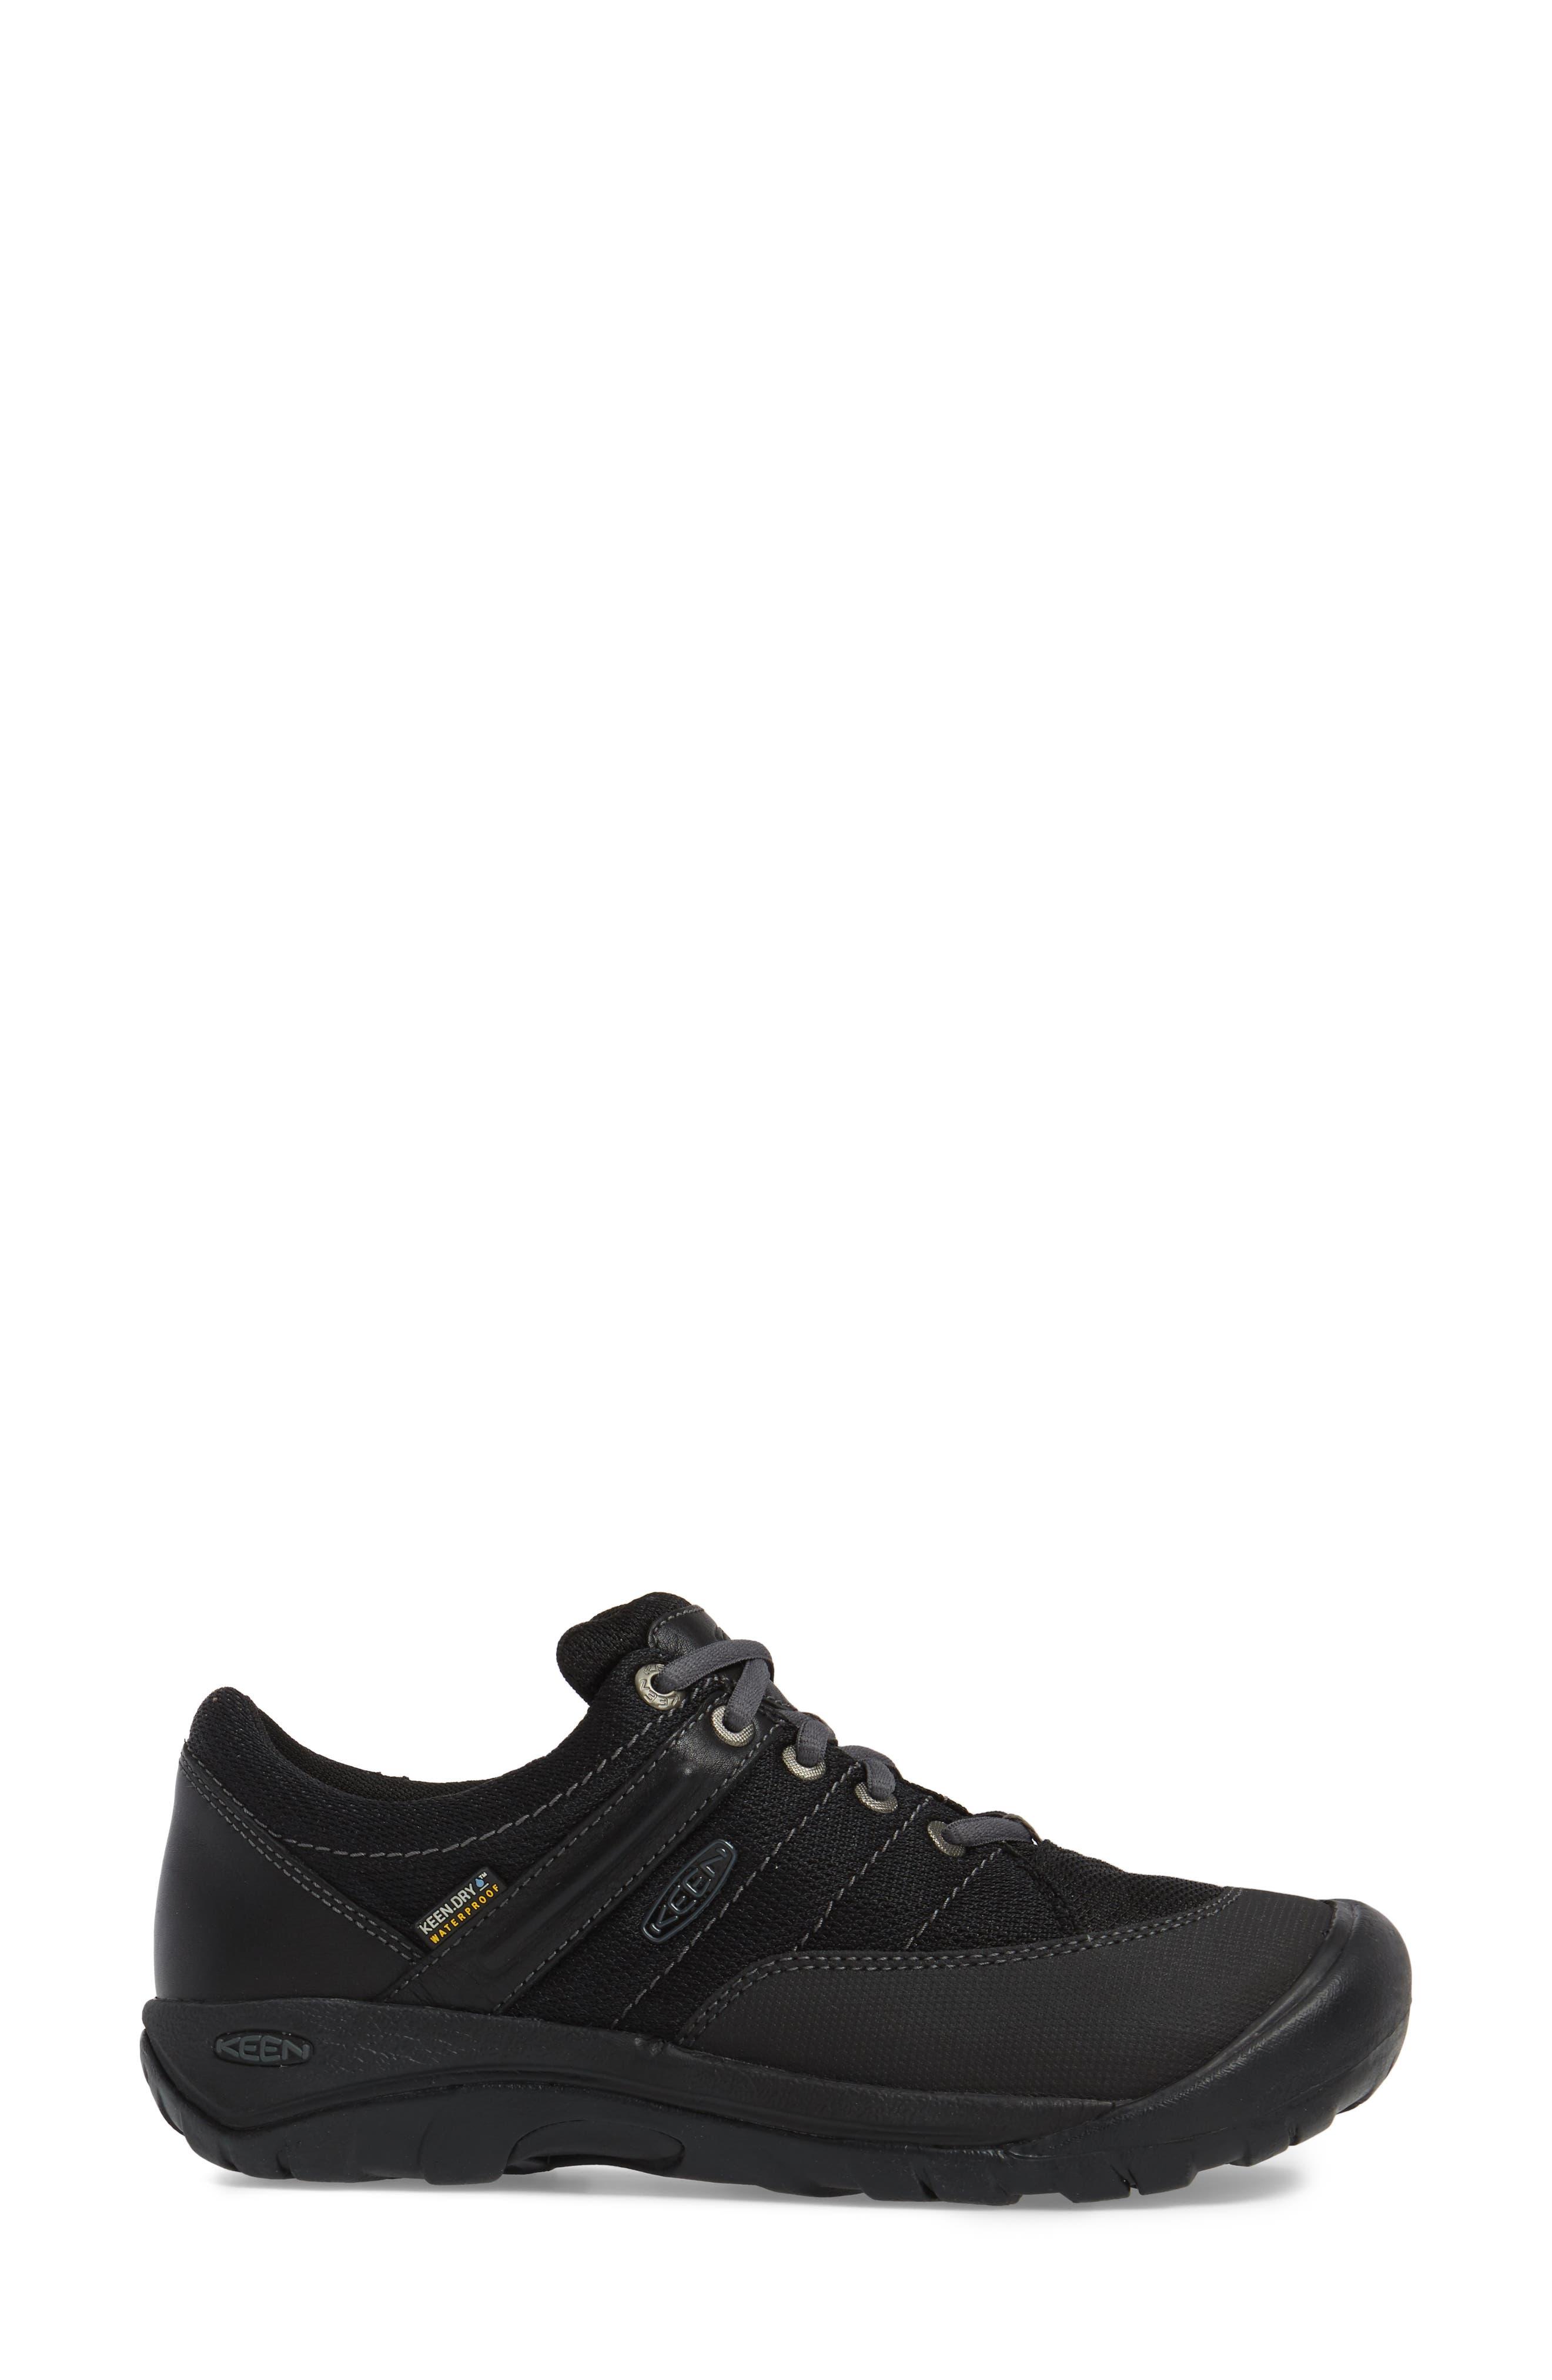 Presidio Waterproof Sport Sneaker,                             Alternate thumbnail 3, color,                             BLACK LEATHER